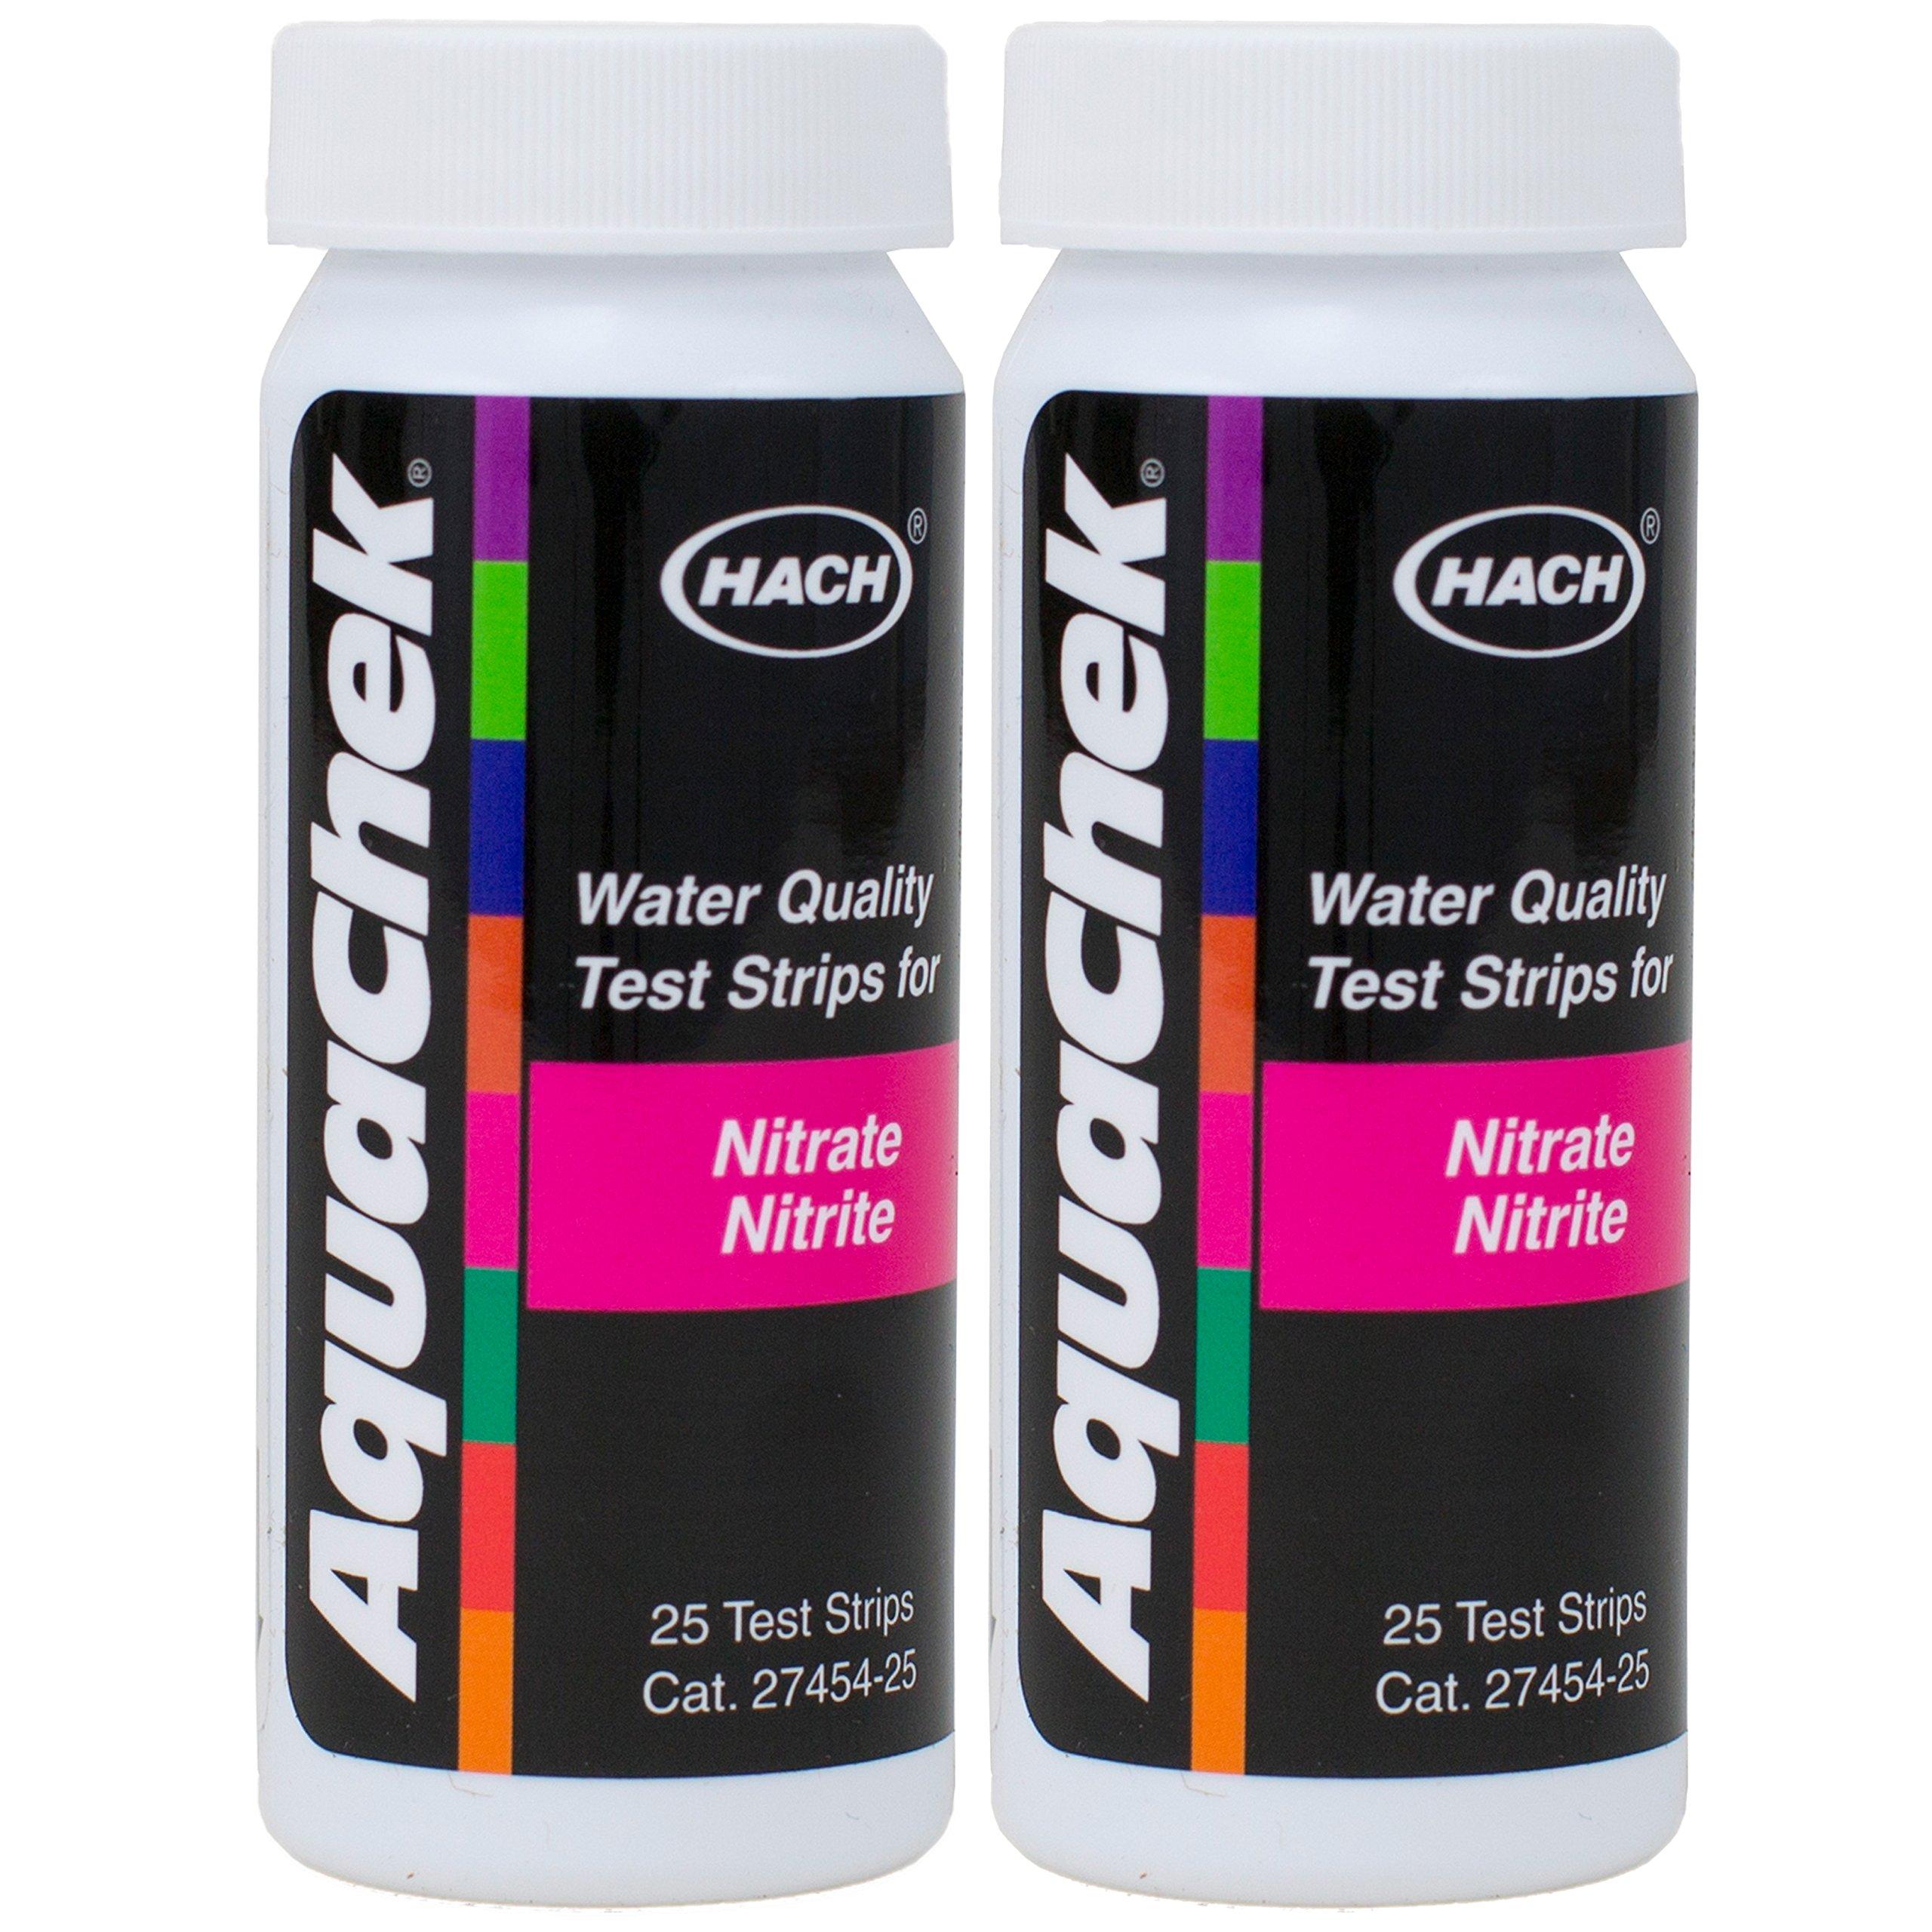 AquaChek Nitrate Nitrite Test Strips (25 Count) (2 Pack) by AquaChek